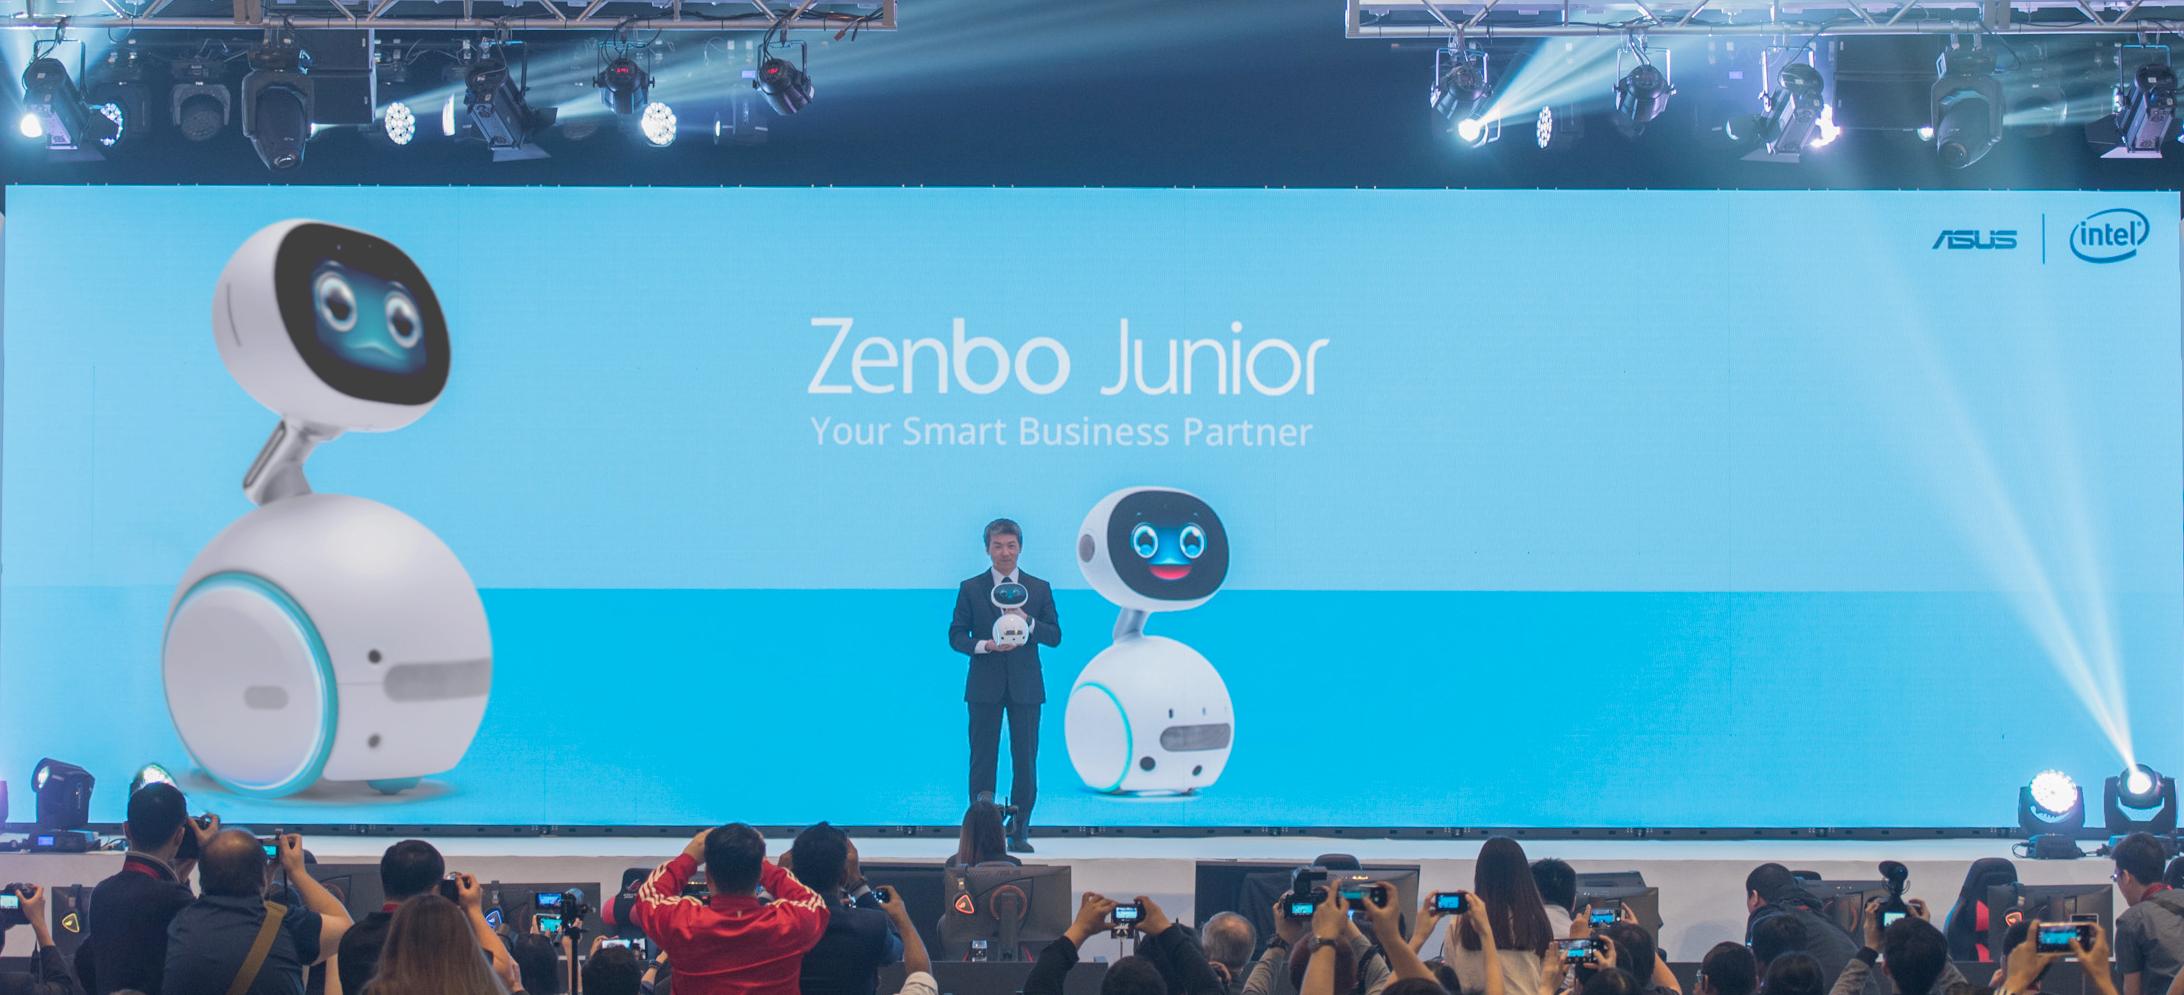 asus corporate vice president jackie hsu presents zenbo junior for the first time at incredible intelligence 2018 press event in malaysia ASUS โชว์นวัตกรรมสินค้าสำหรับการใช้งานในองค์กรธุรกิจ บ้านและการเล่นเกม ที่งาน Incredible Intelligence 2018 ประเทศมาเลเซีย